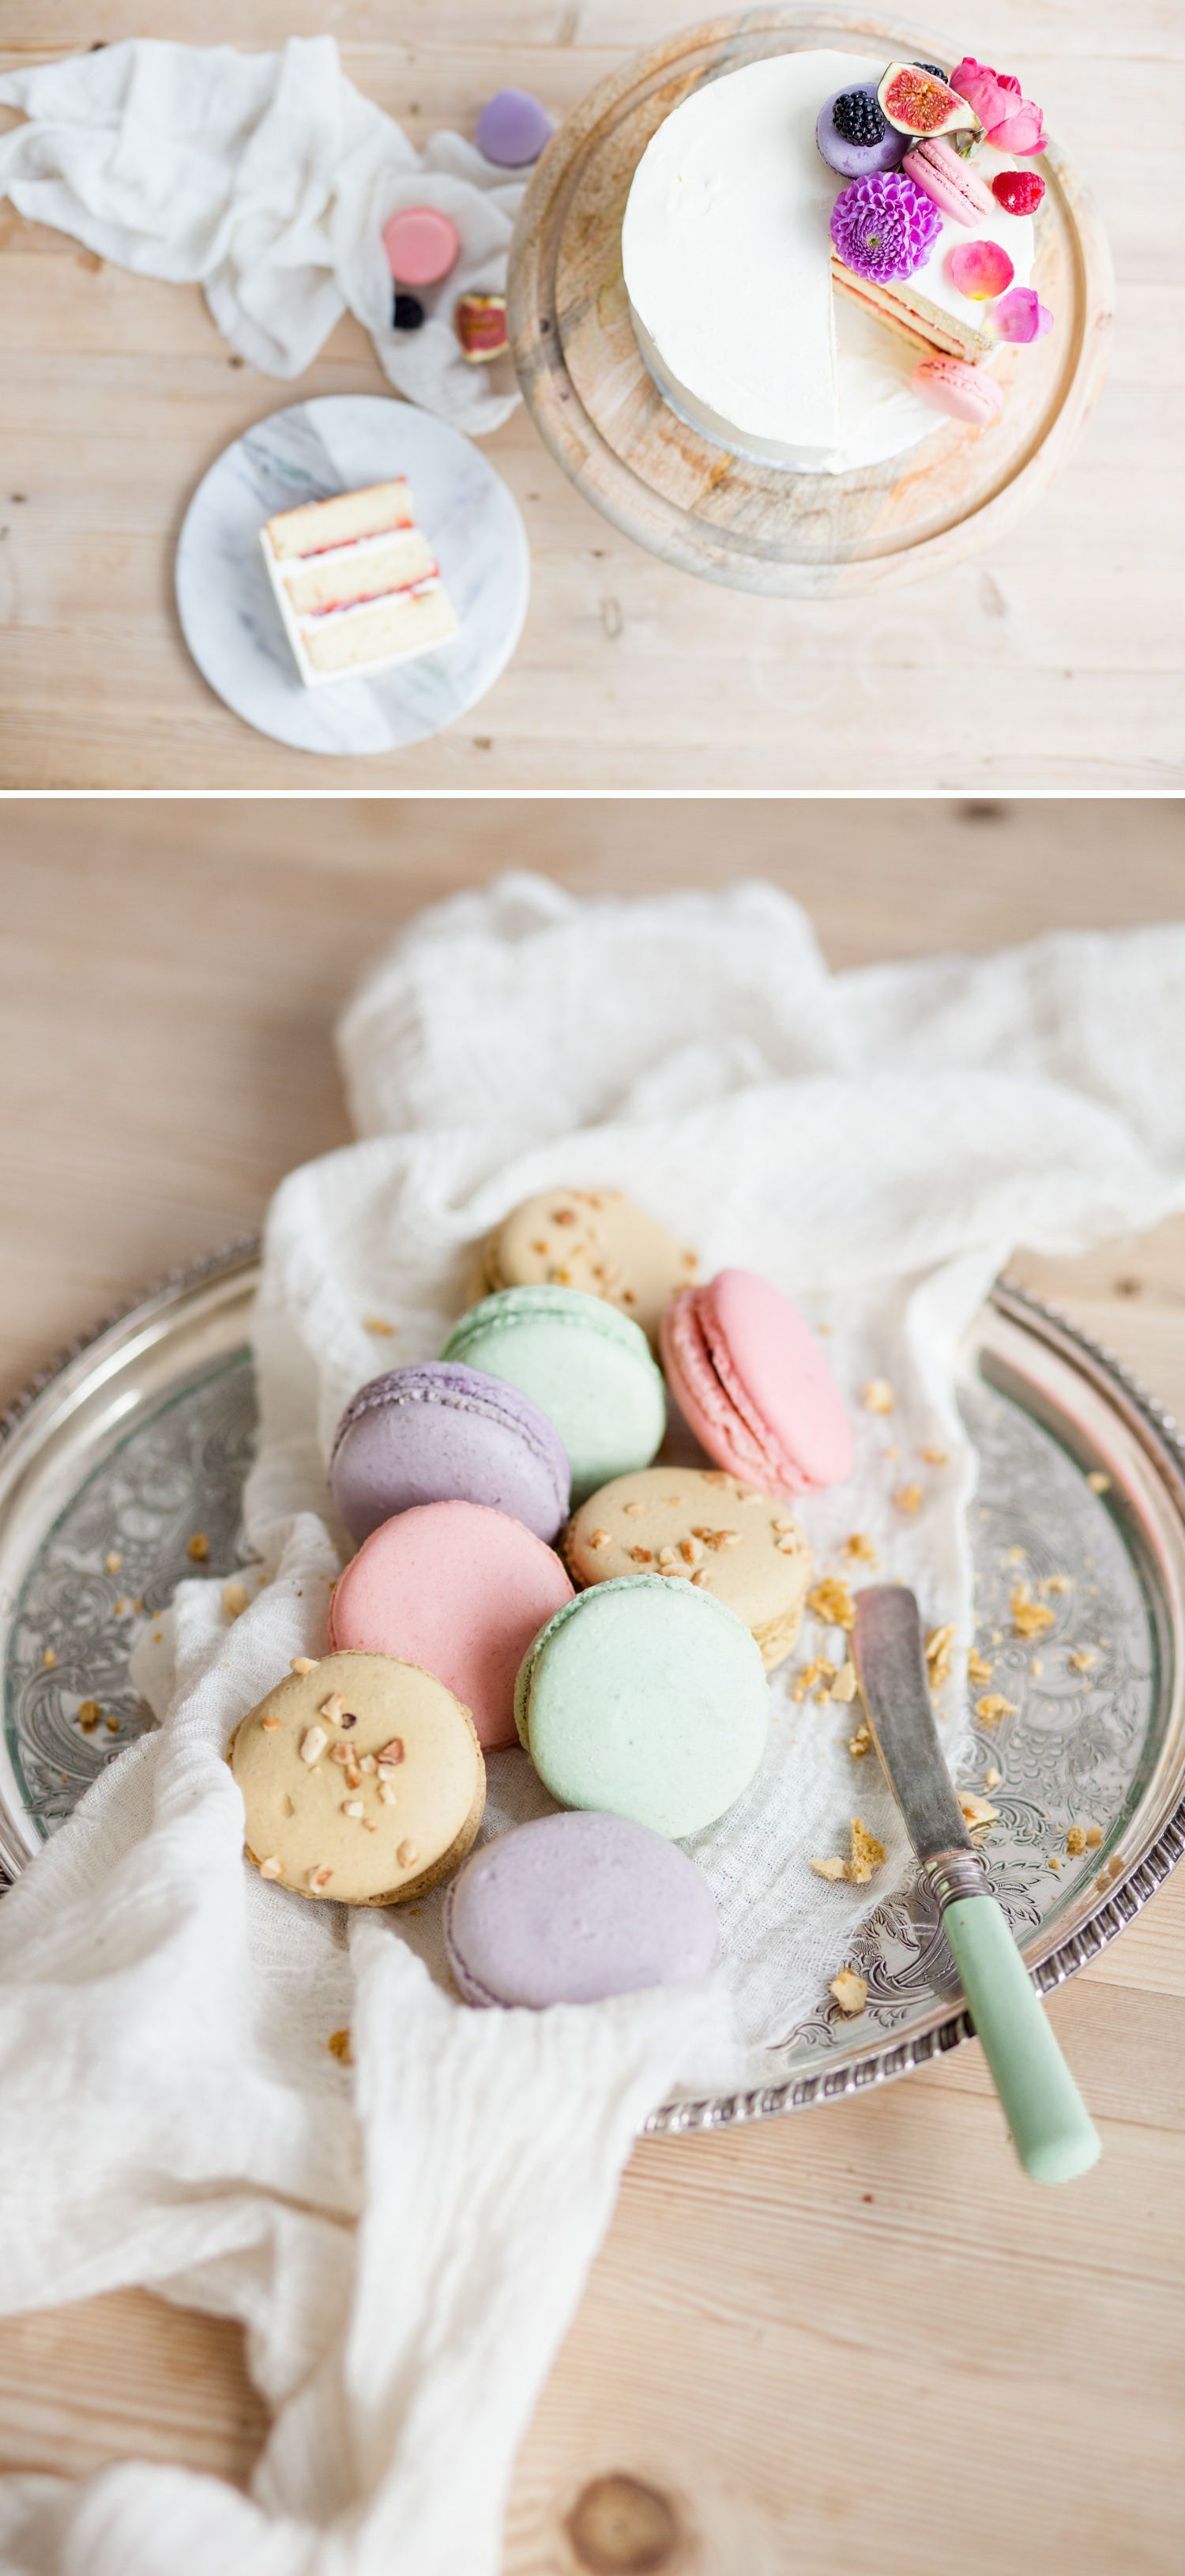 Personal branding shoot for Milk Street Kitchen - pastel macarons